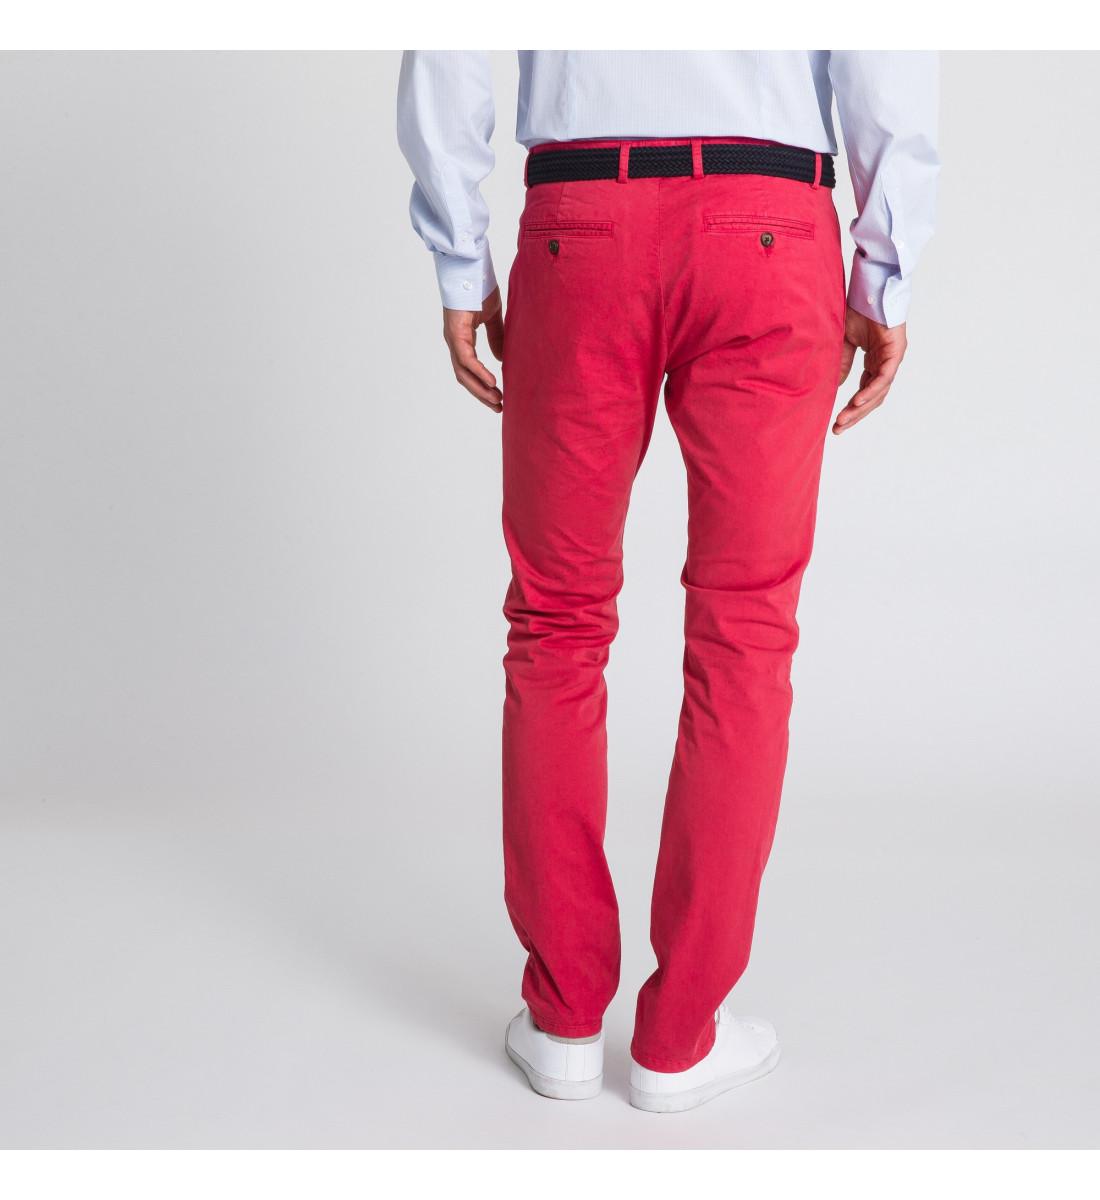 Pantalon CHINO homme Rouge